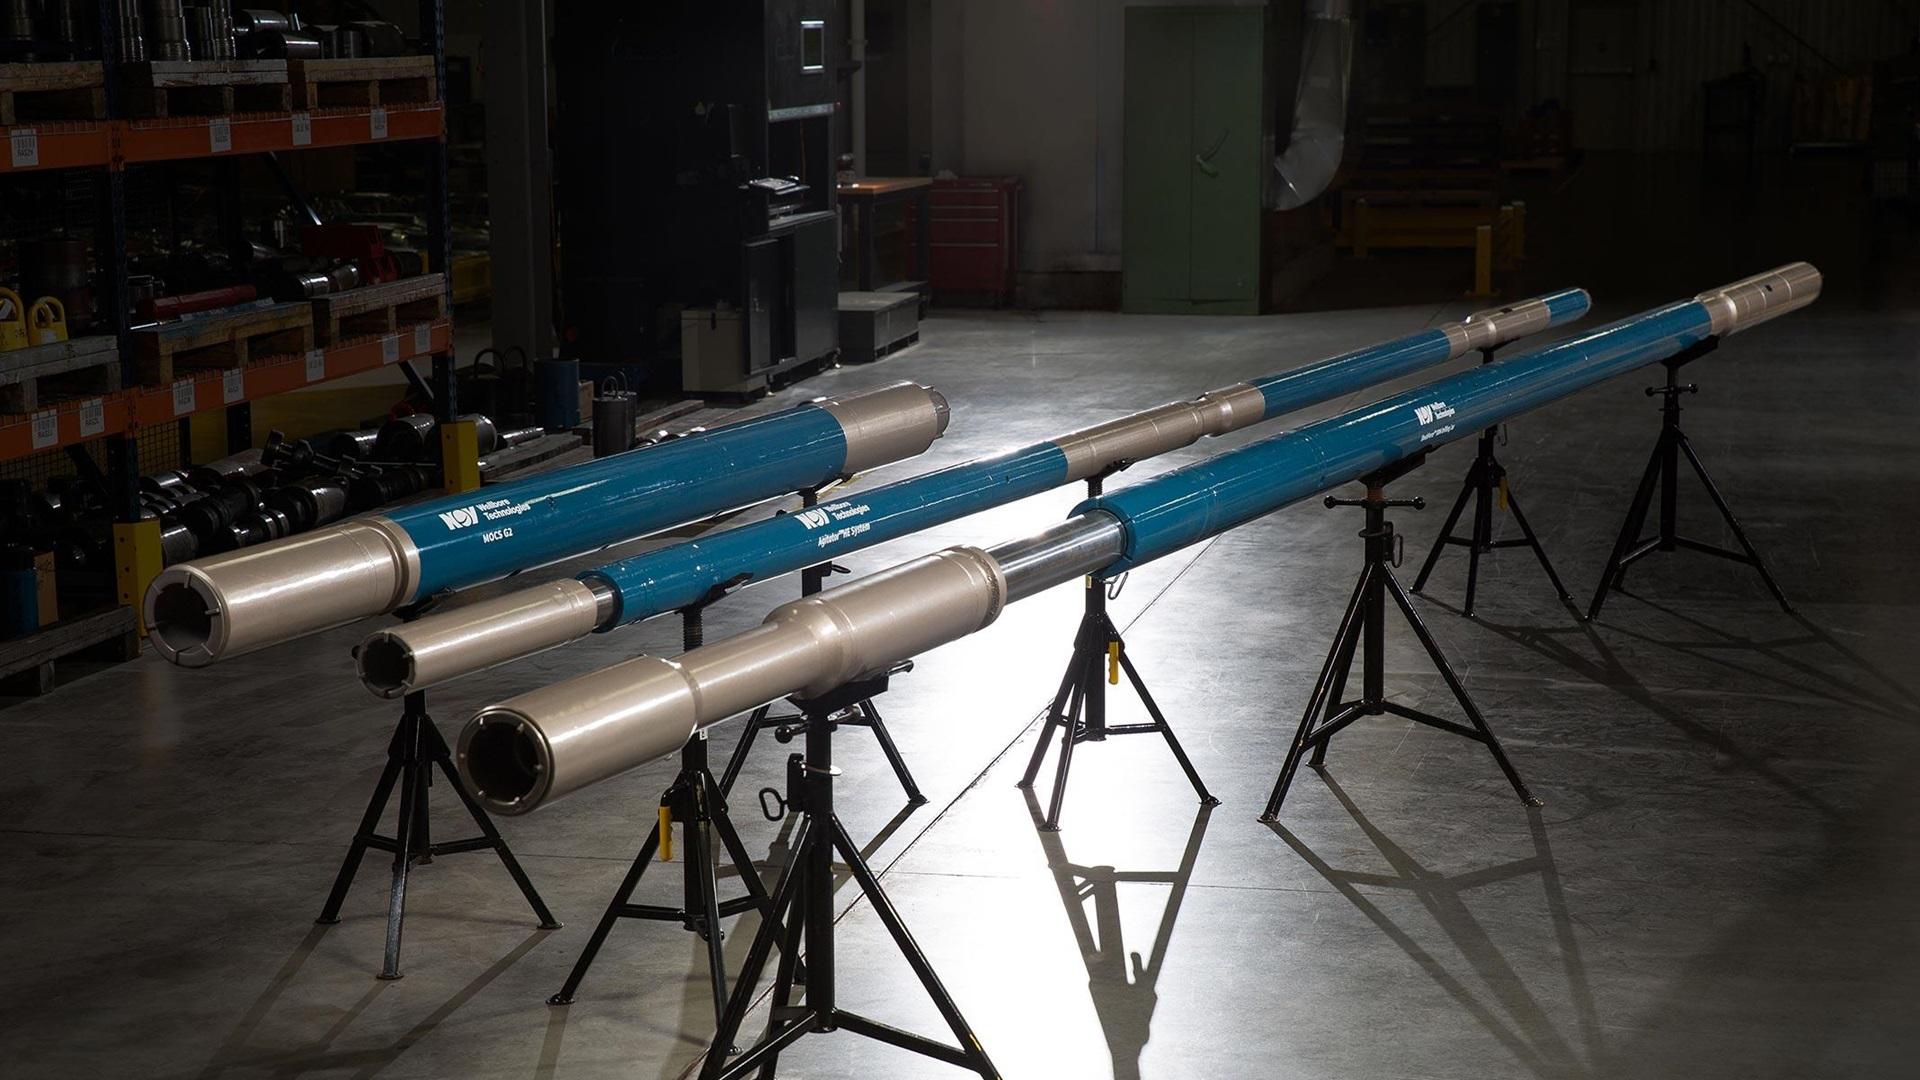 Full size wide shot of ShockForce Drilling Jars on tripods